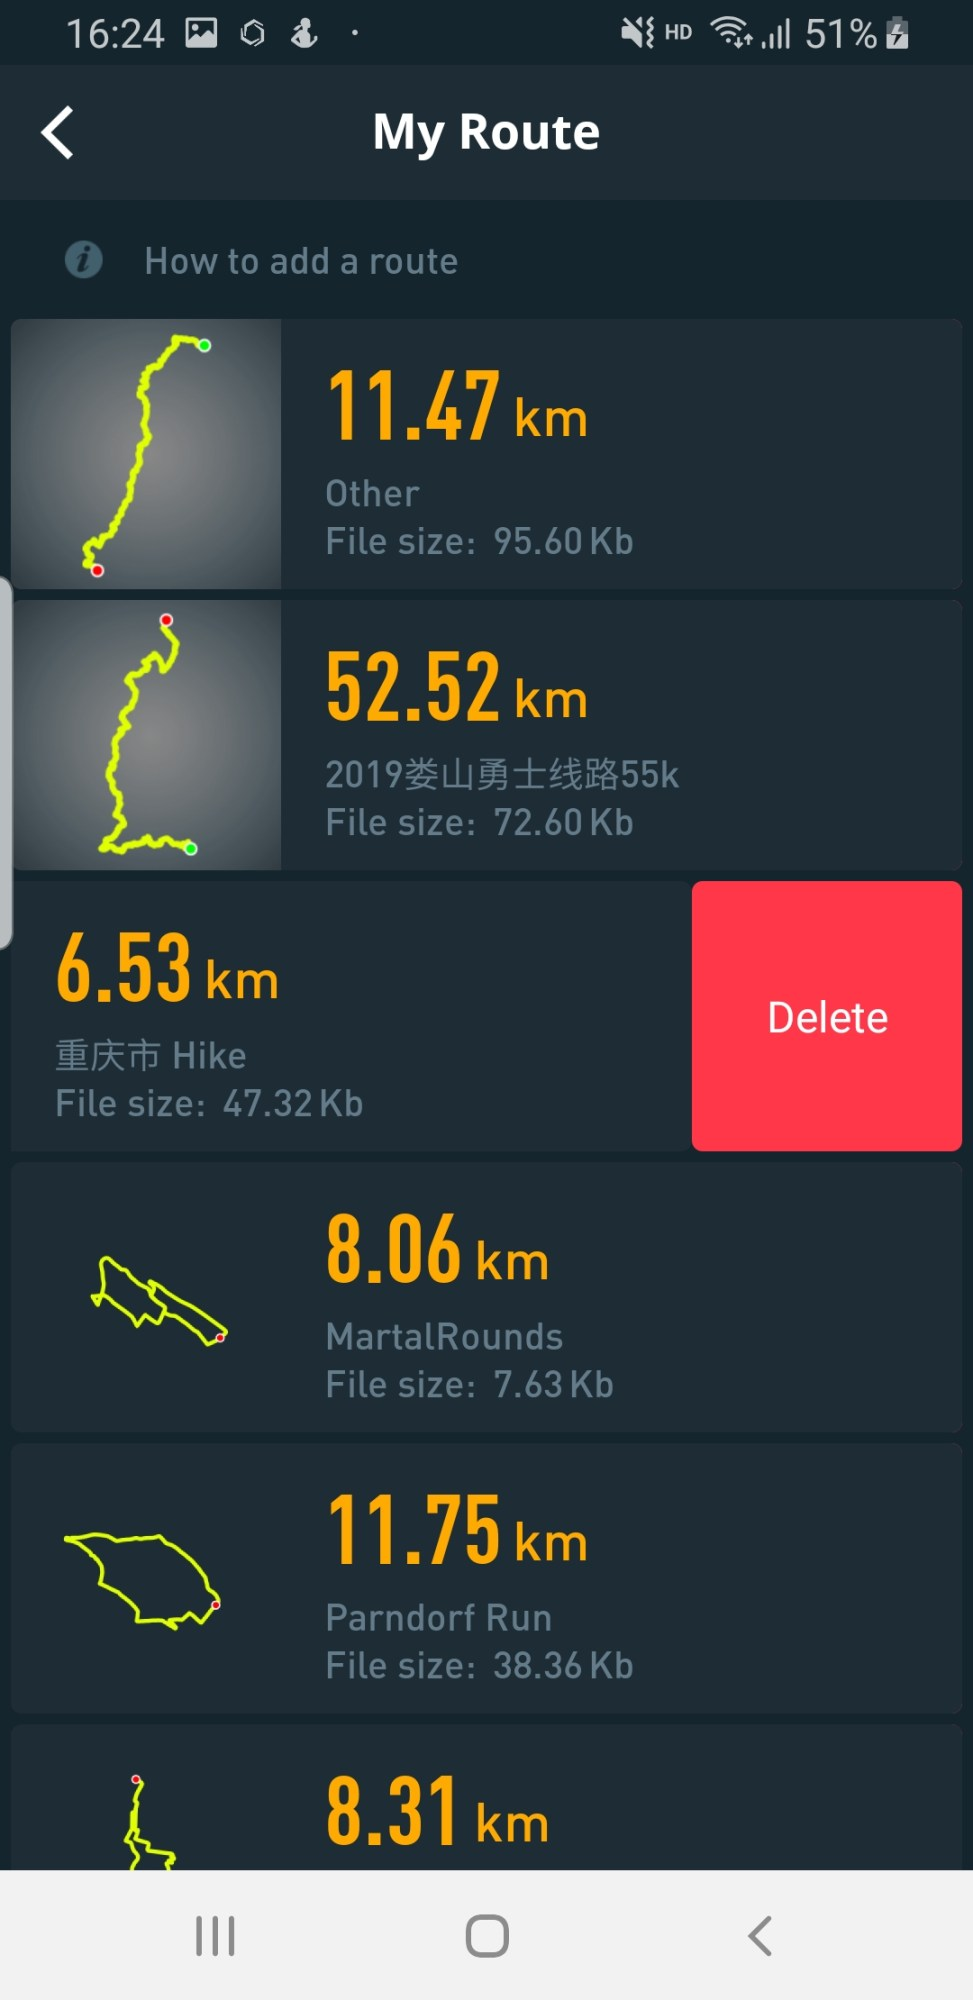 Coros App: Delete route